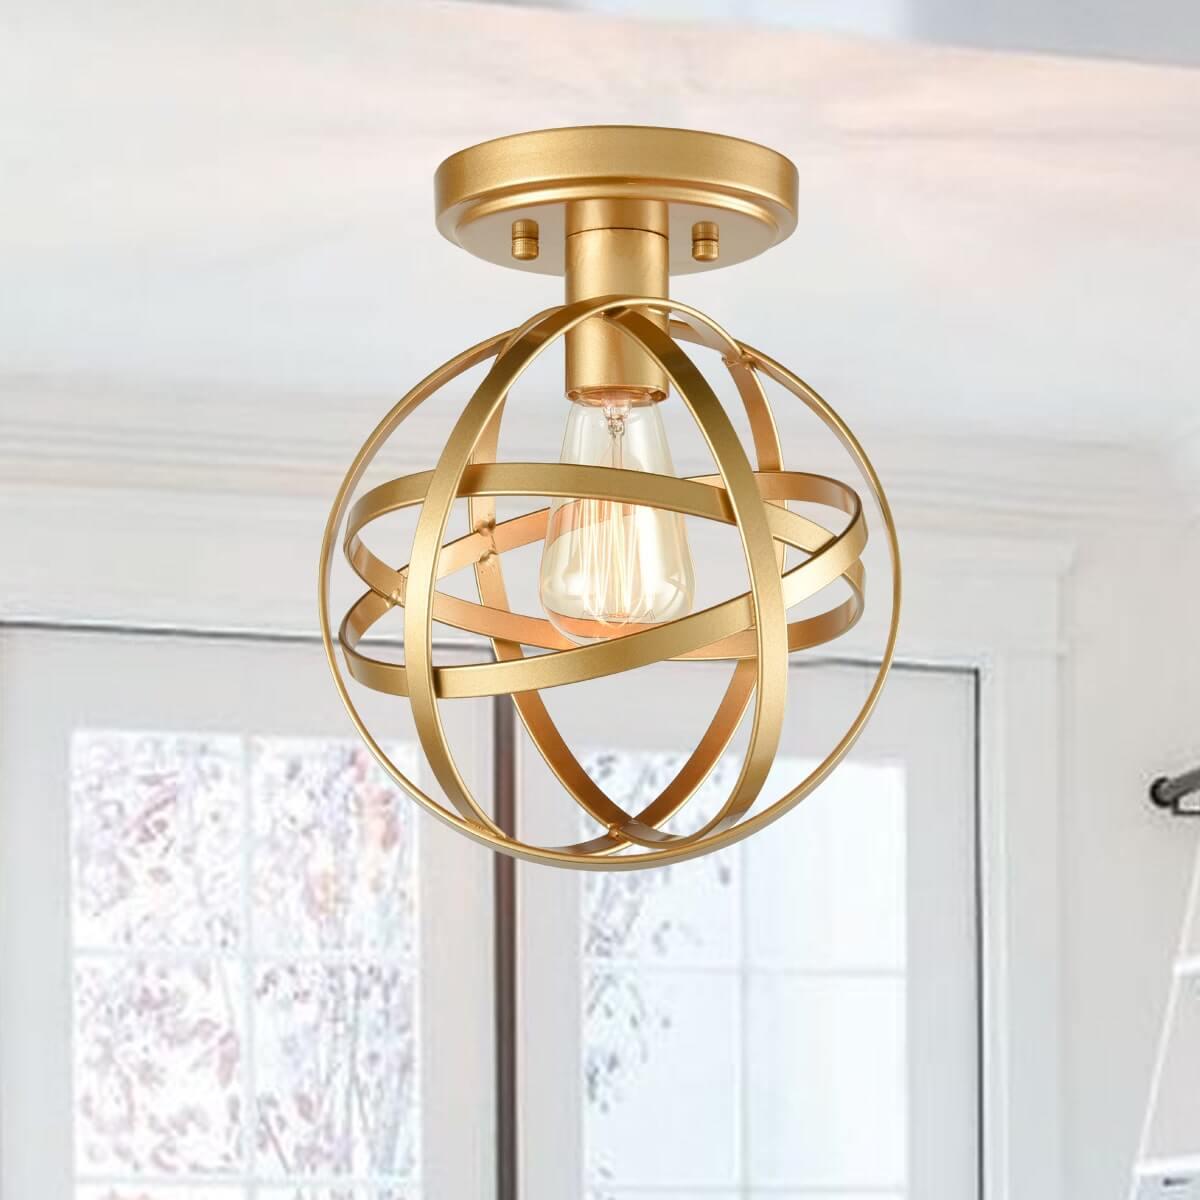 Industrial Flush Mount Ceiling Light Brass Globe Hallway Light